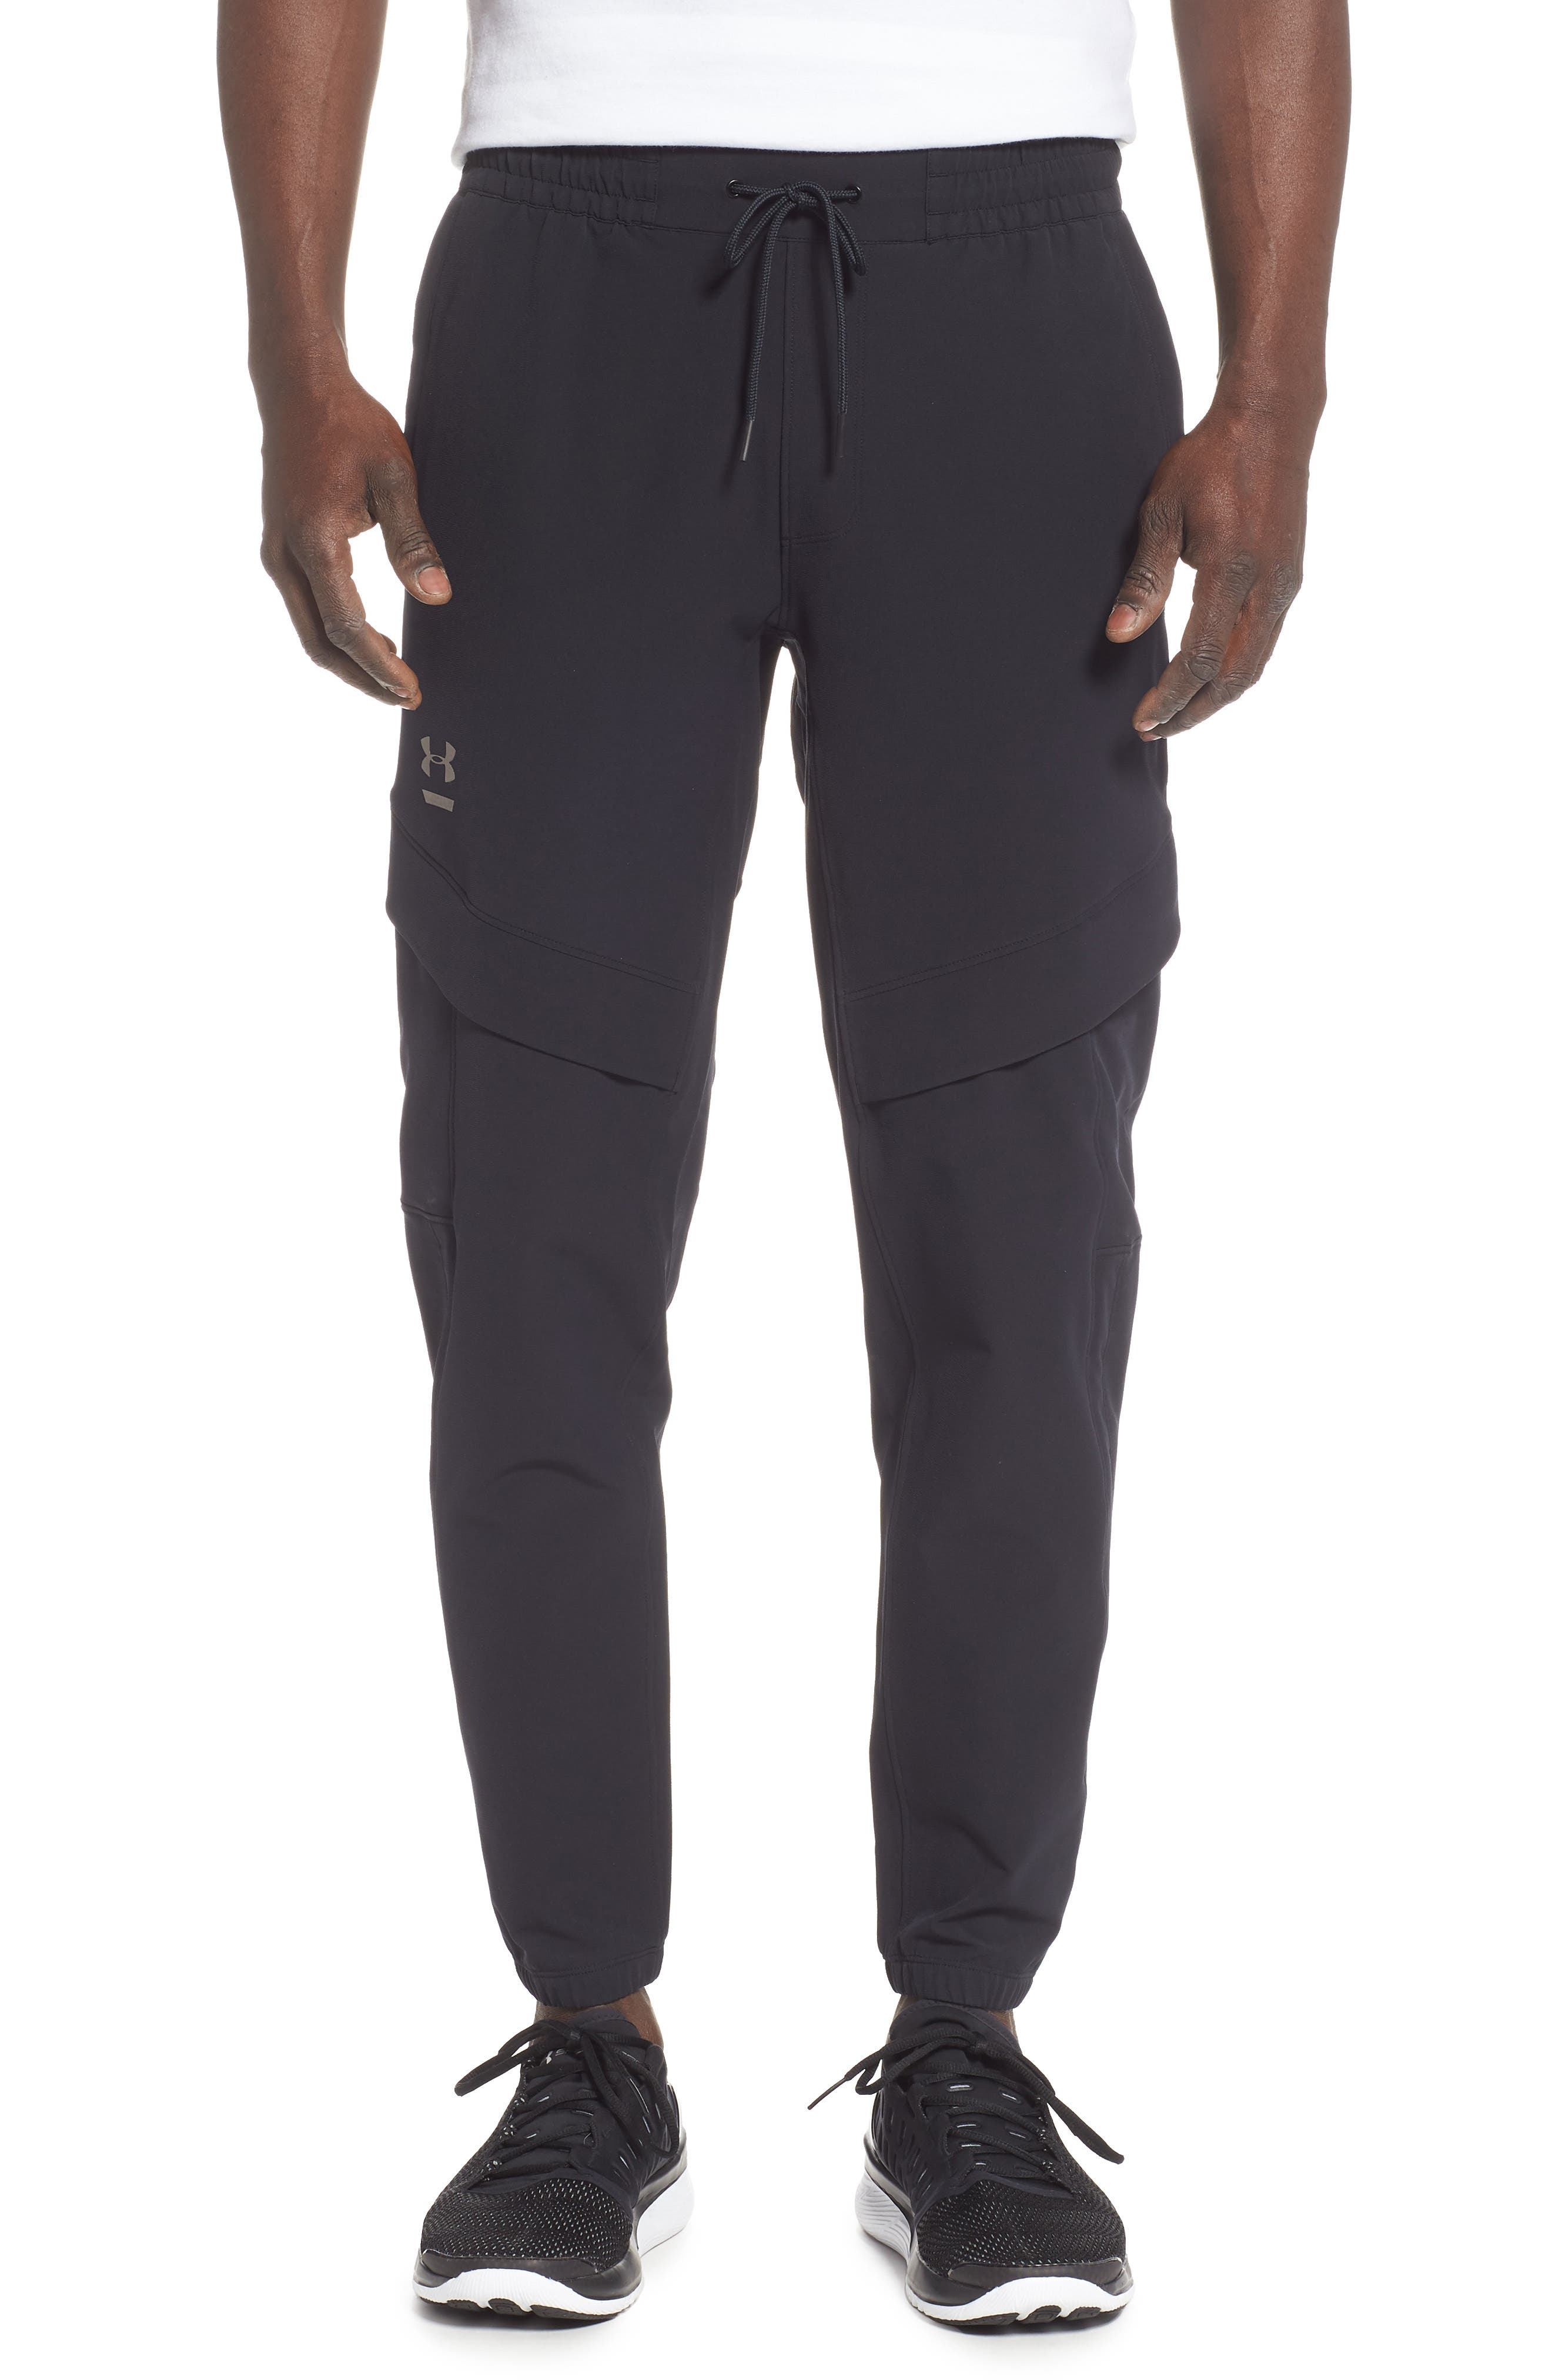 Under Armour Perpetual Cargo Pants, Black